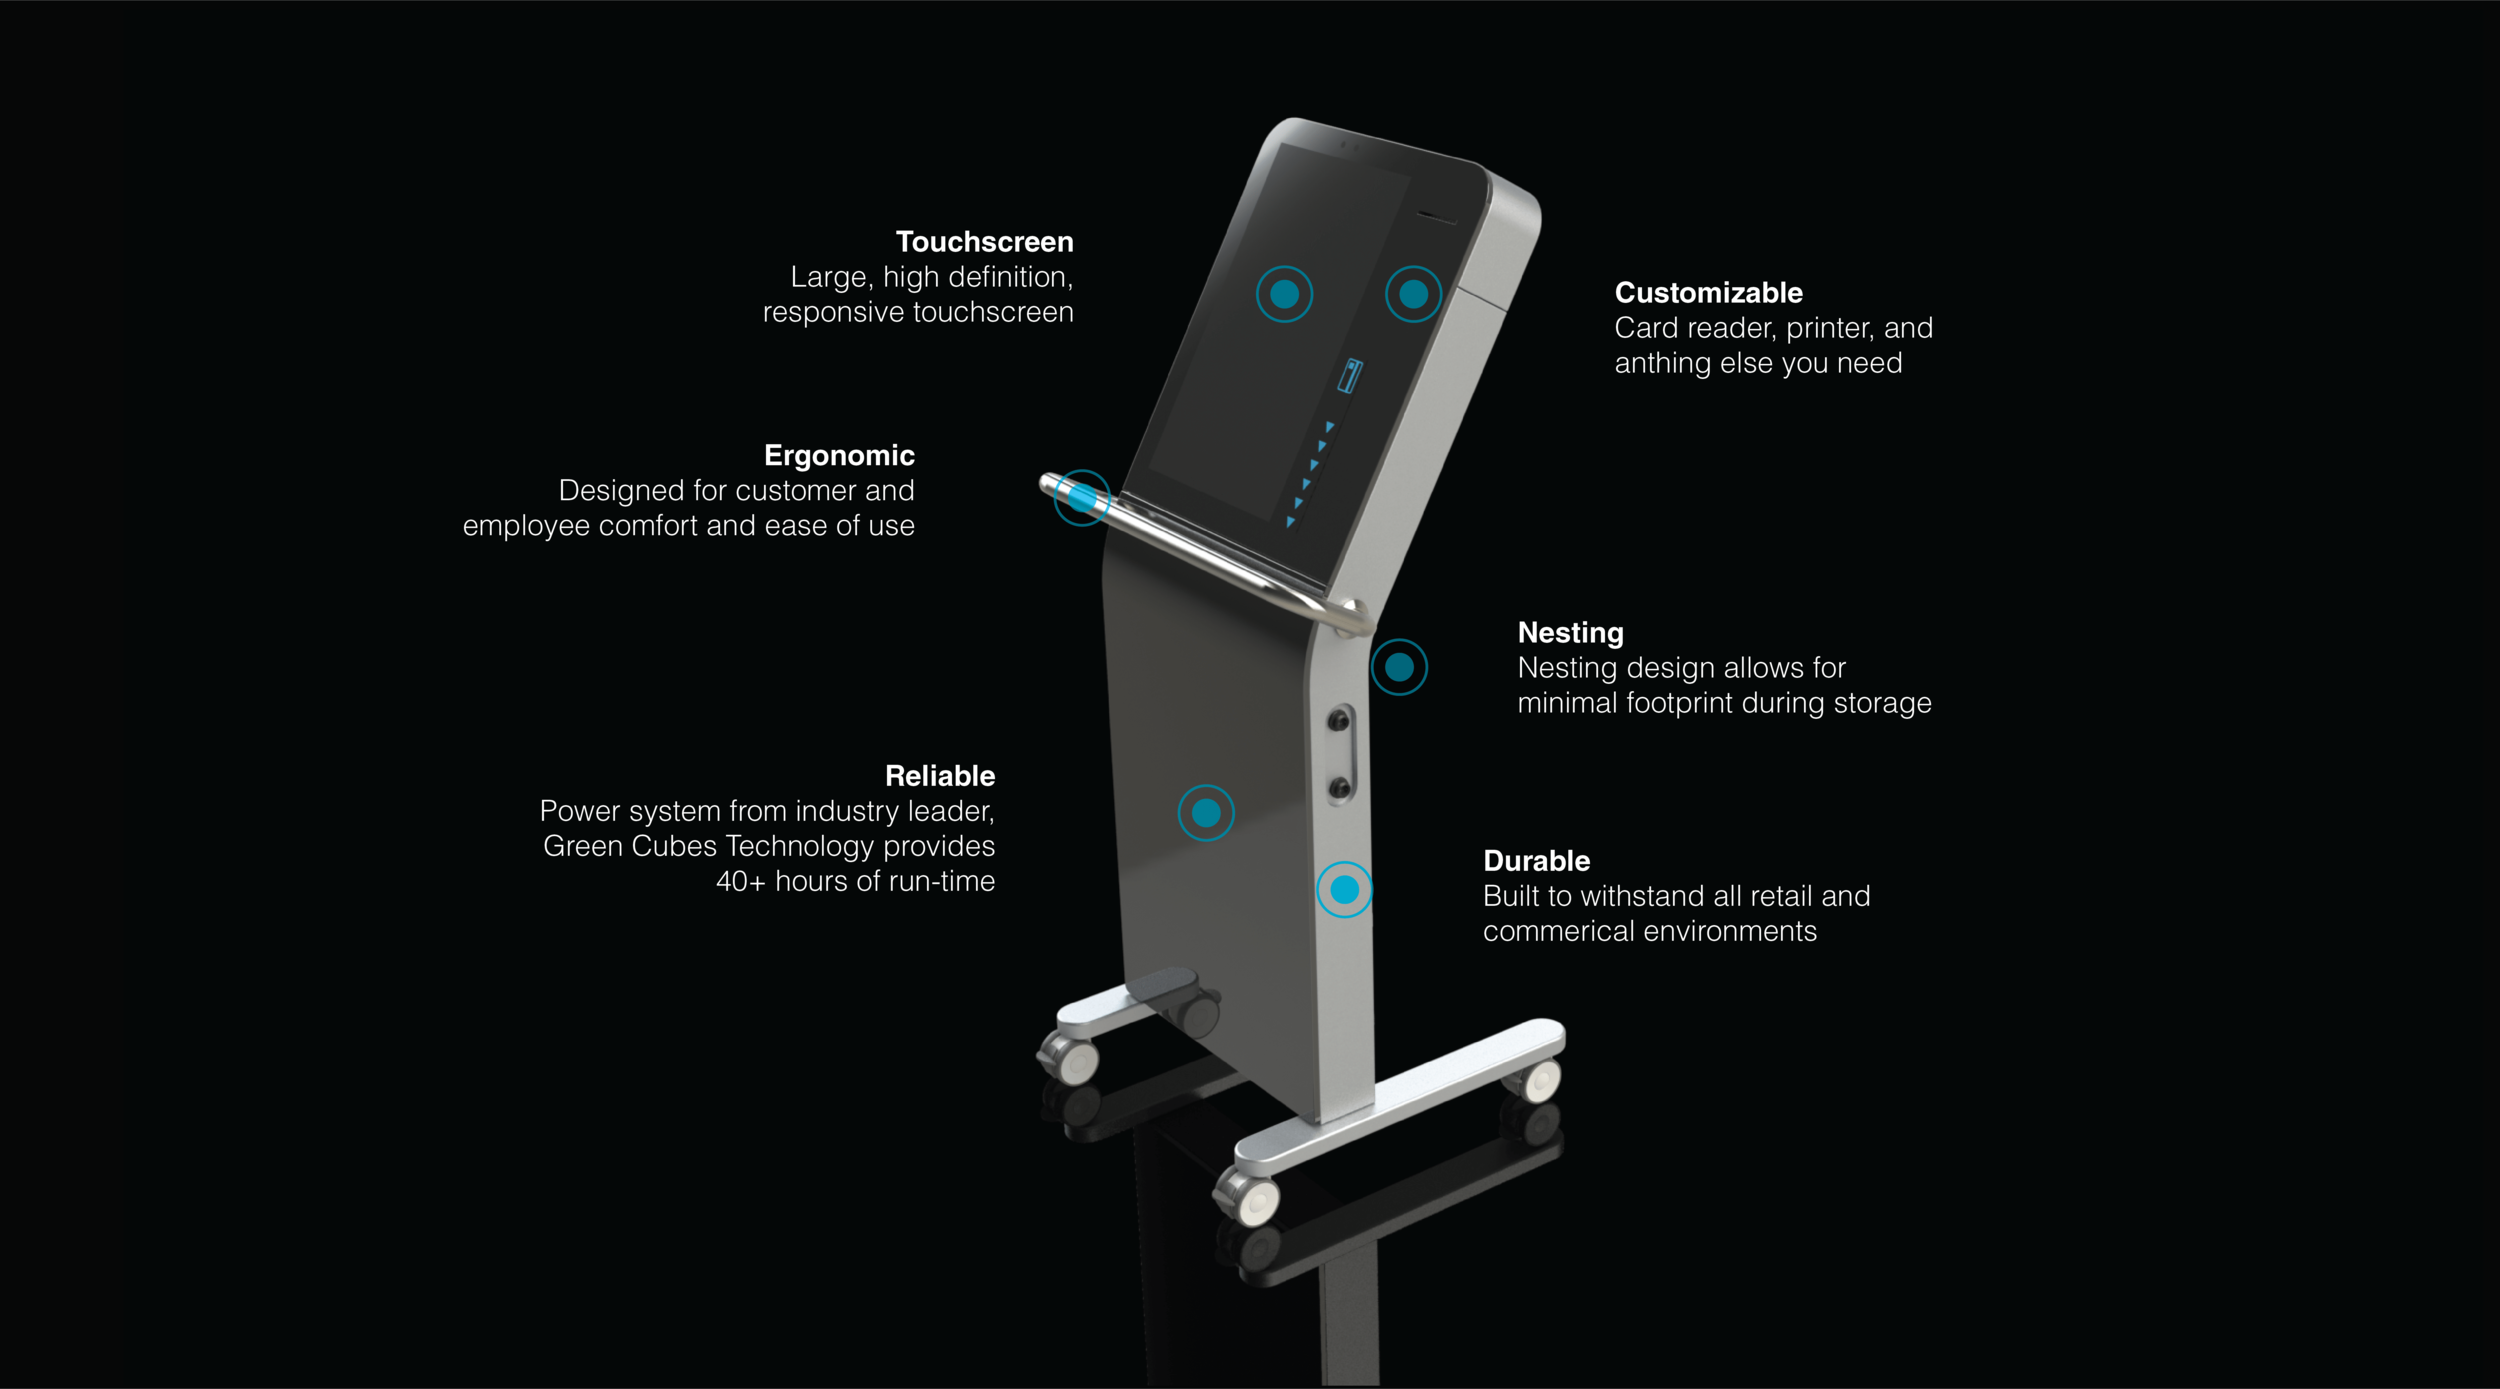 powered-self-service-kiosk-point-of-sales-pos-kiosk